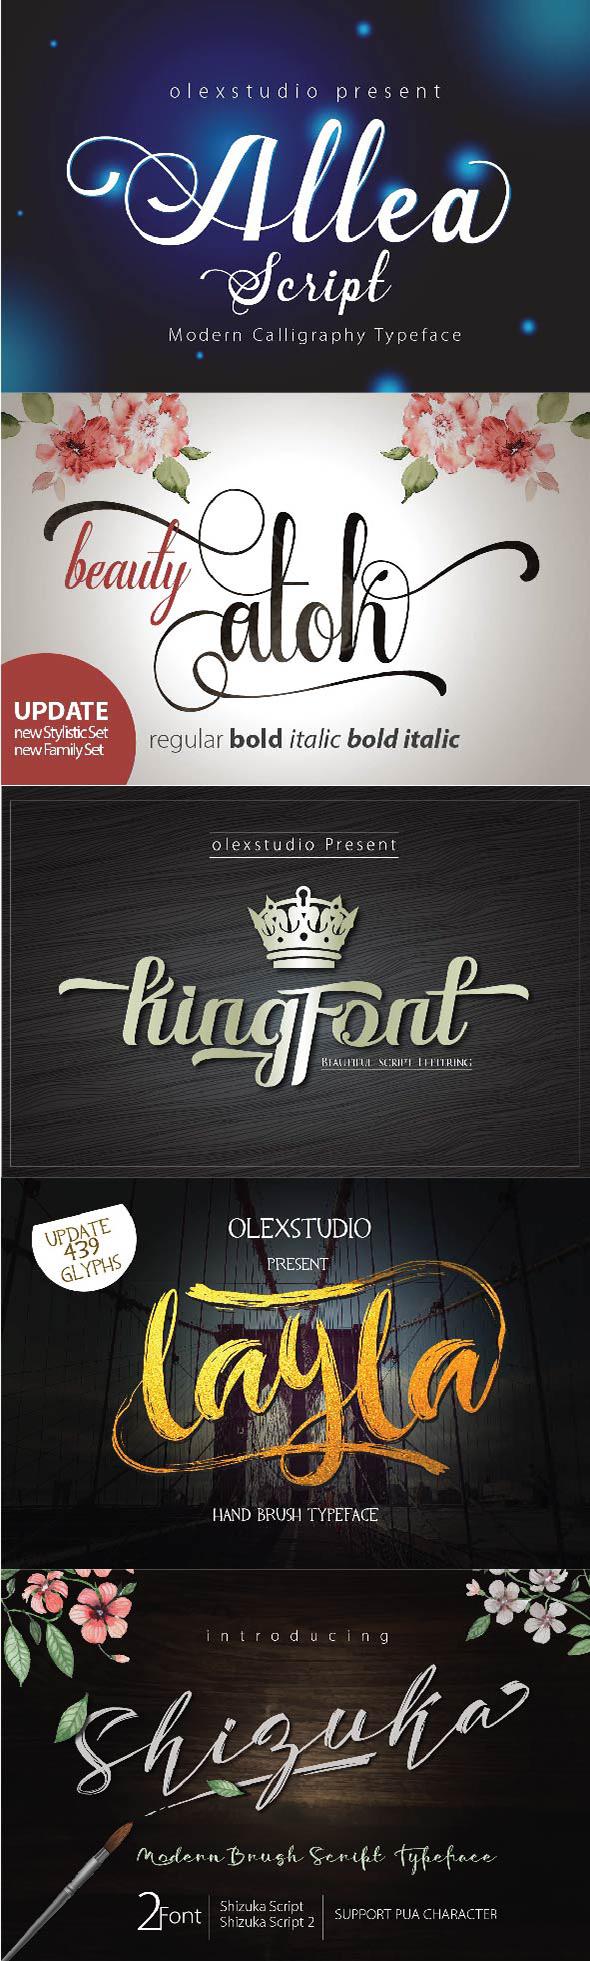 Free Font January 5 Script Font Bundle Download